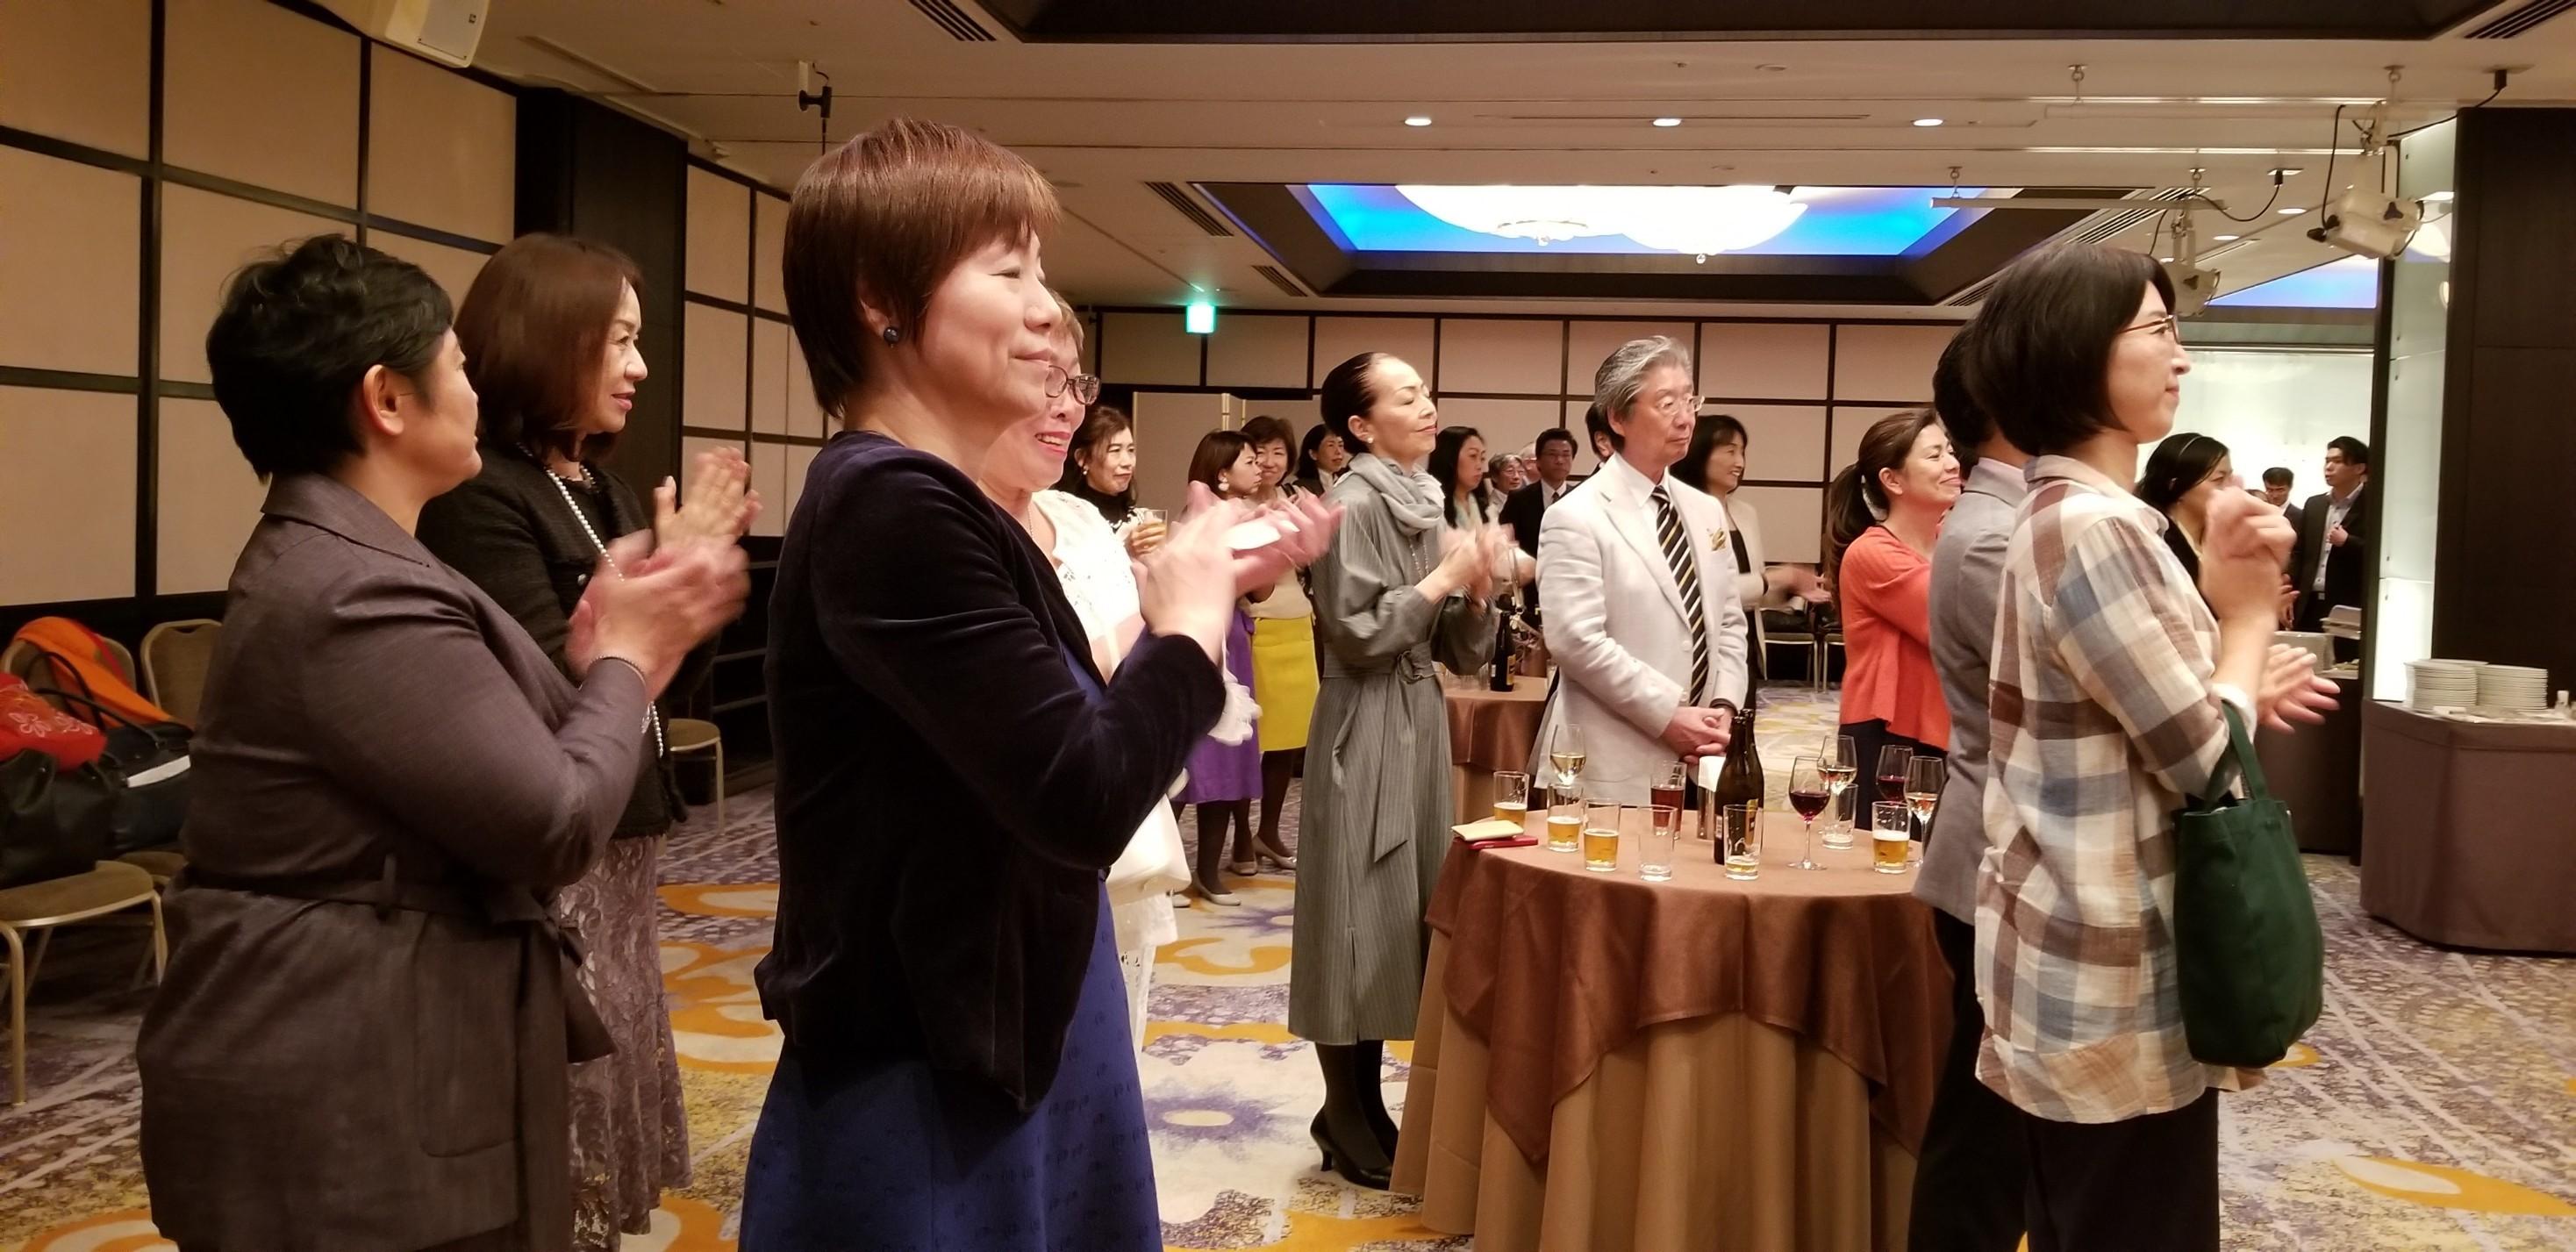 bbaff817be8ef3c64d8ae77508a3507e - 第6回思風会全国大会2018in東京開催